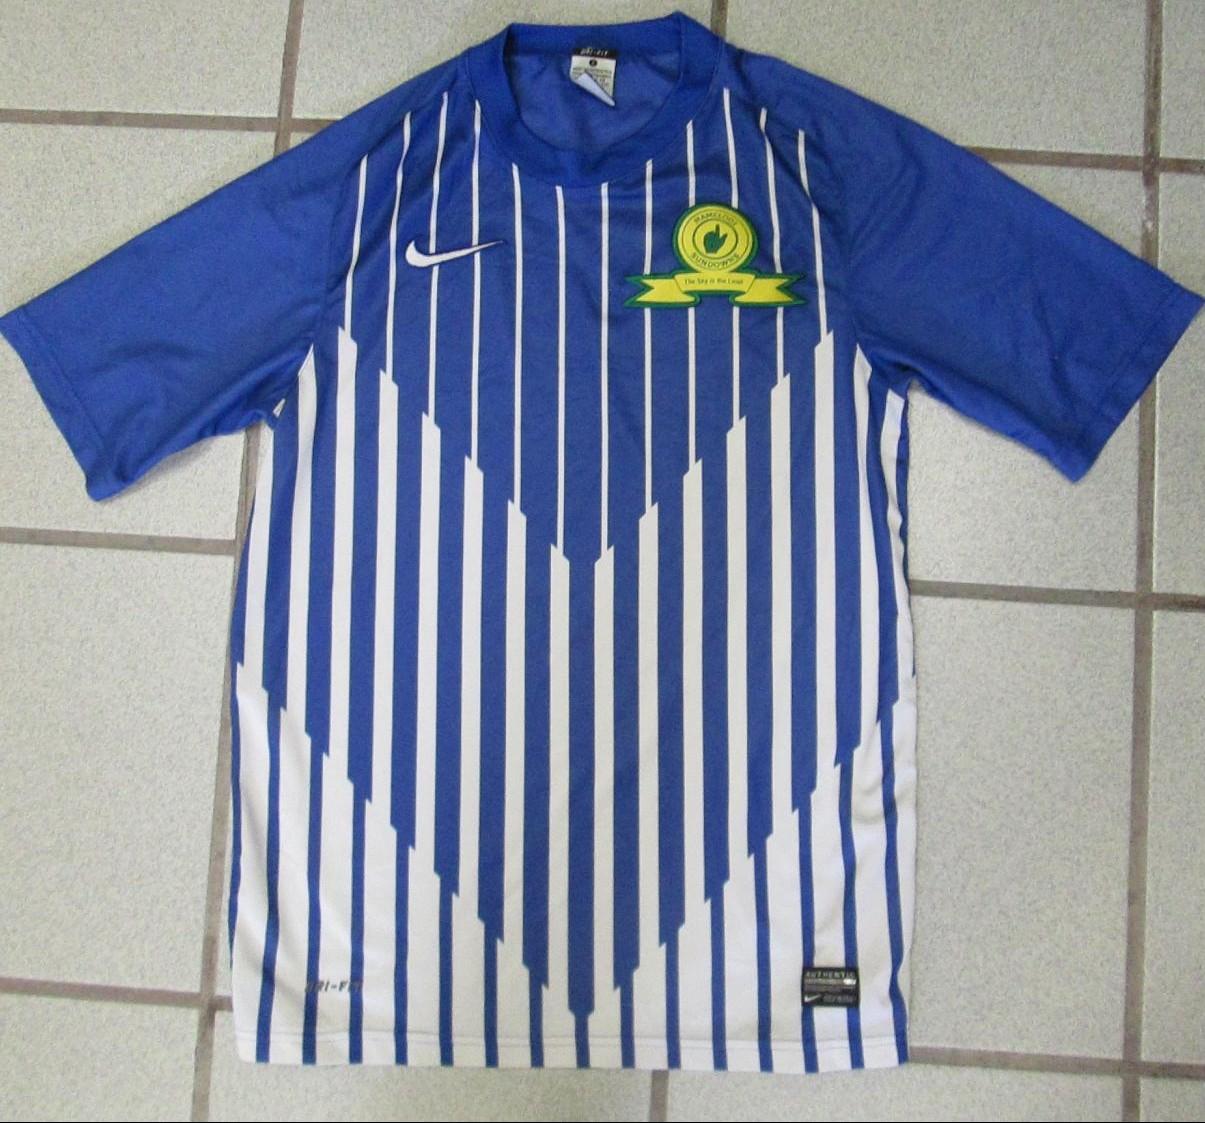 Fußball-Trikots Nike Herren Mamelodi Sundowns FC Home Trikot 2009 2010 Heimtrikot gelb Größe XL